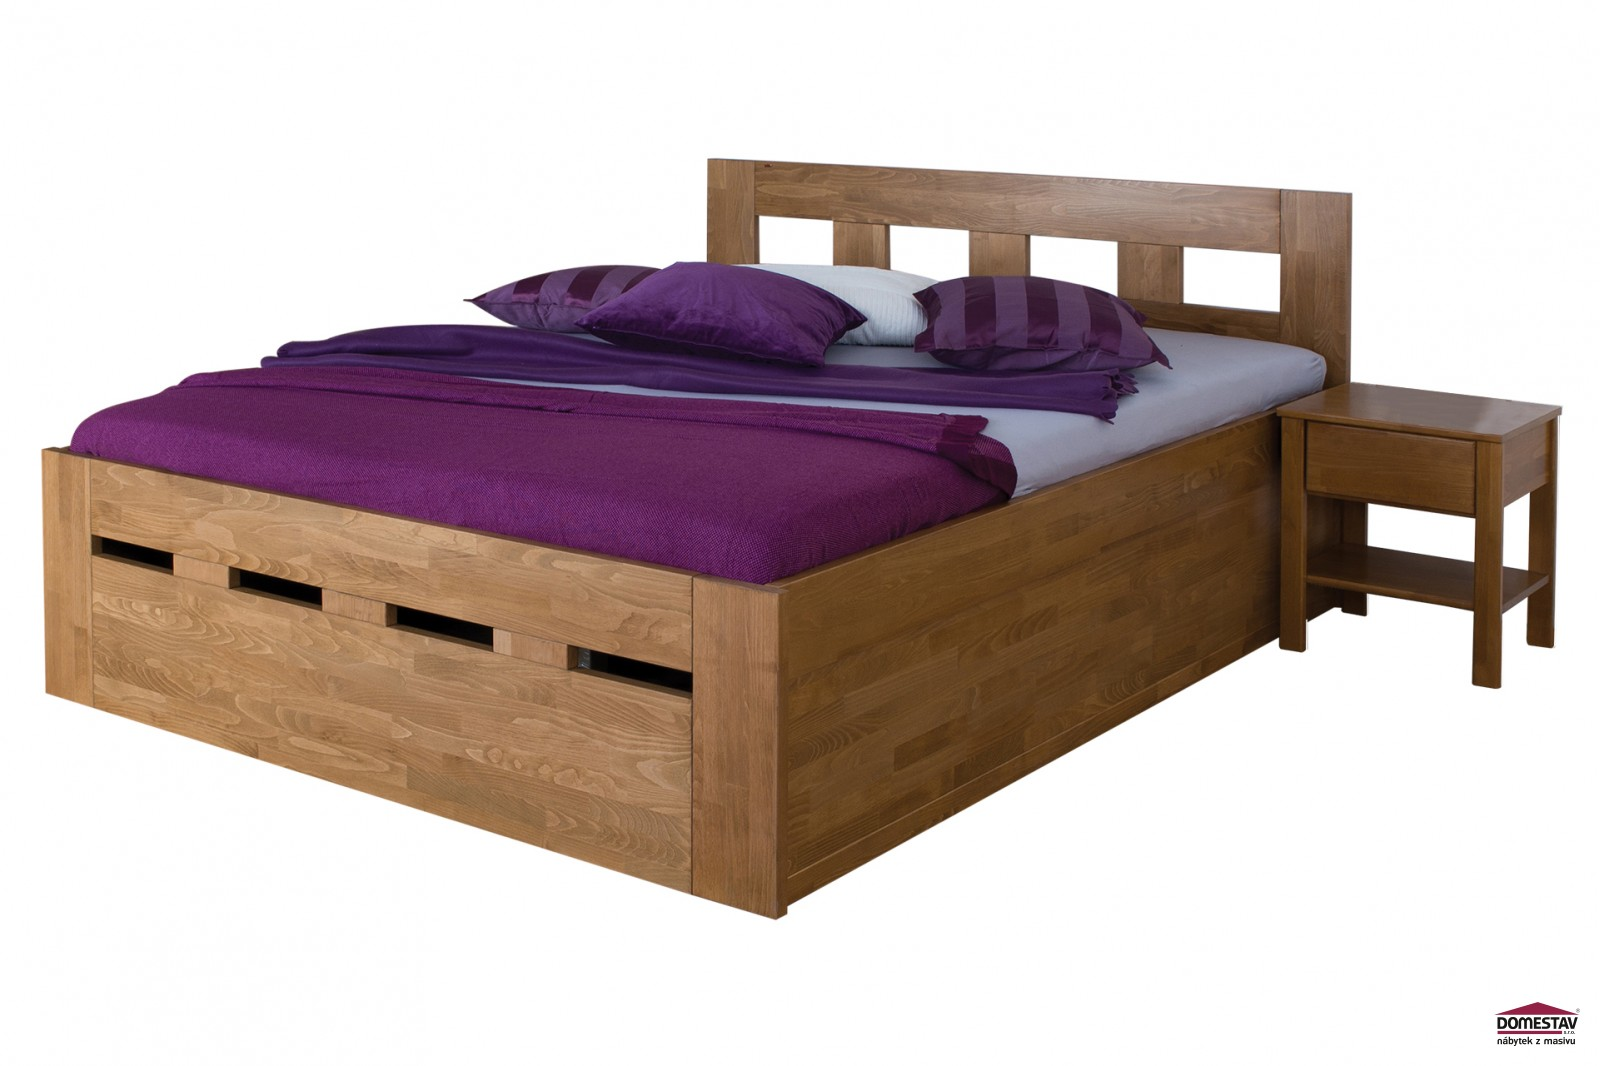 49a3e66fb8d9 Manželská postel MERIDA Senior s úložným prostorem 180 cm buk cink ...